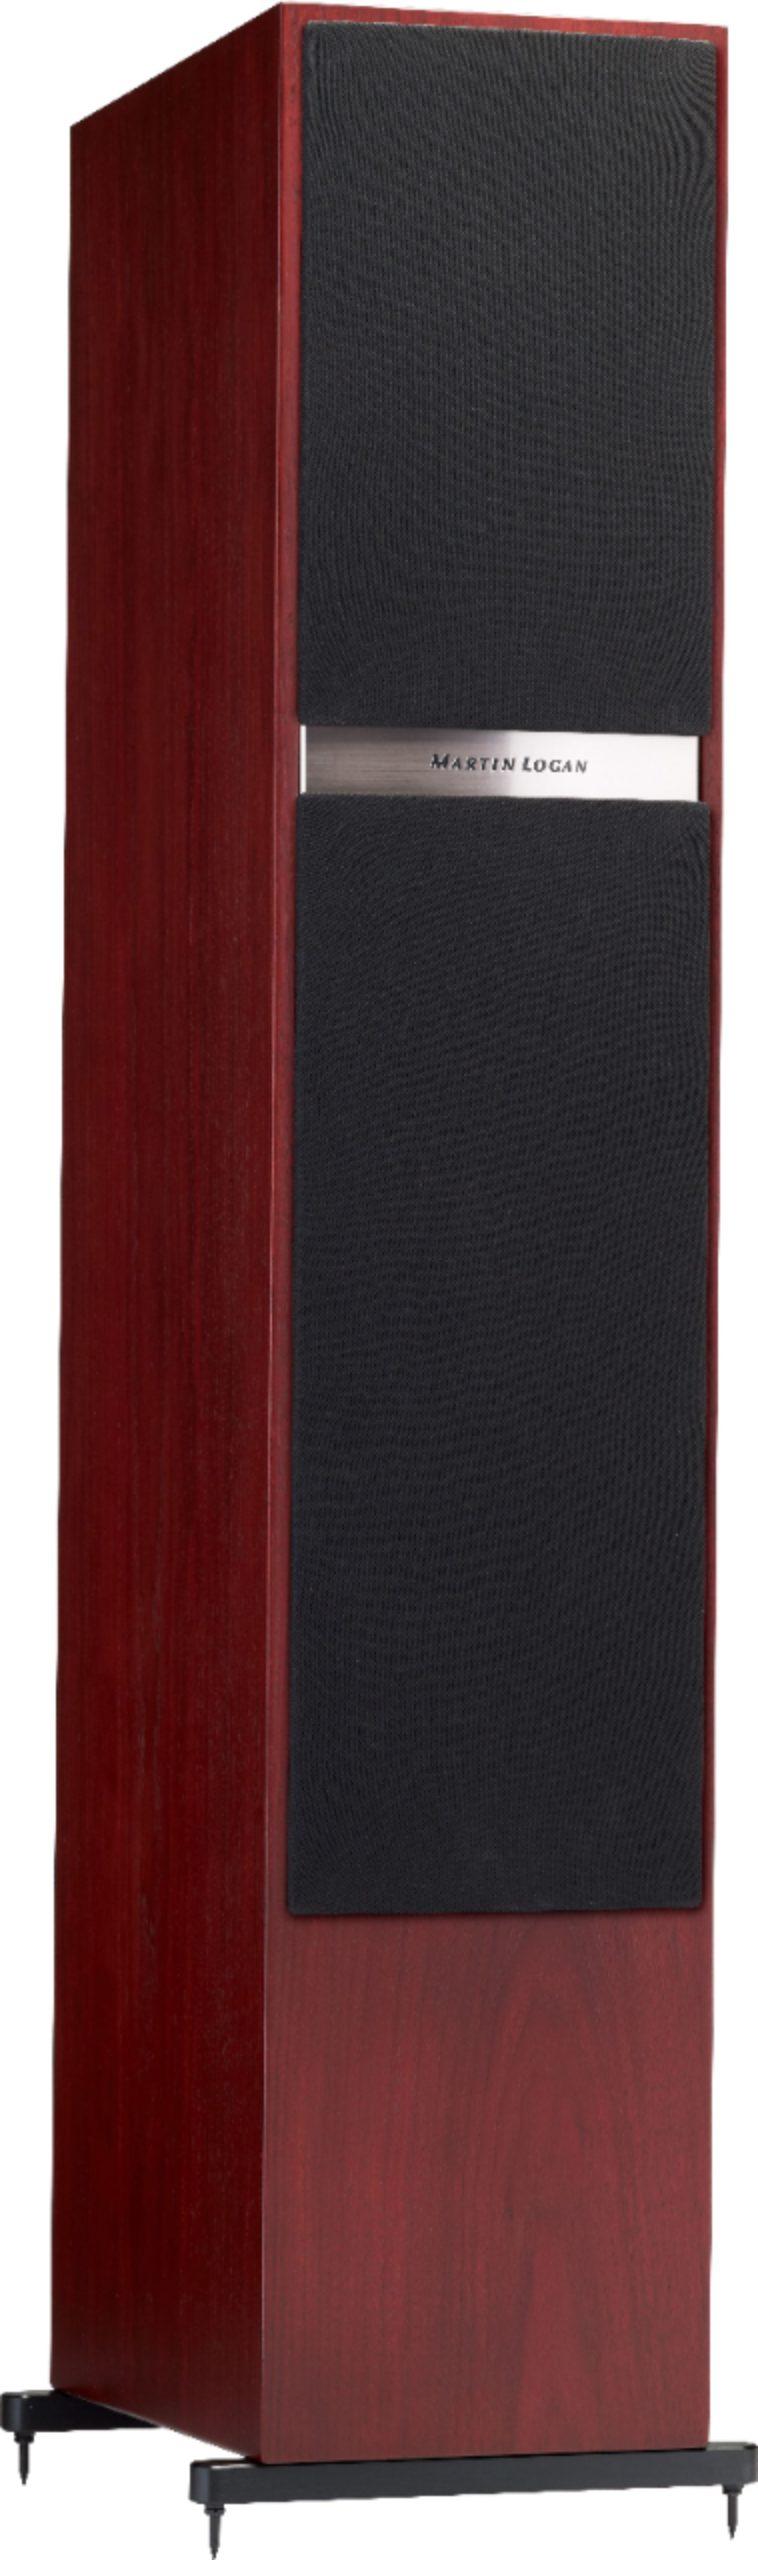 "Motion Dual 8"" Passive 2.5-Way Floor Speaker (Each) Red Walnut"